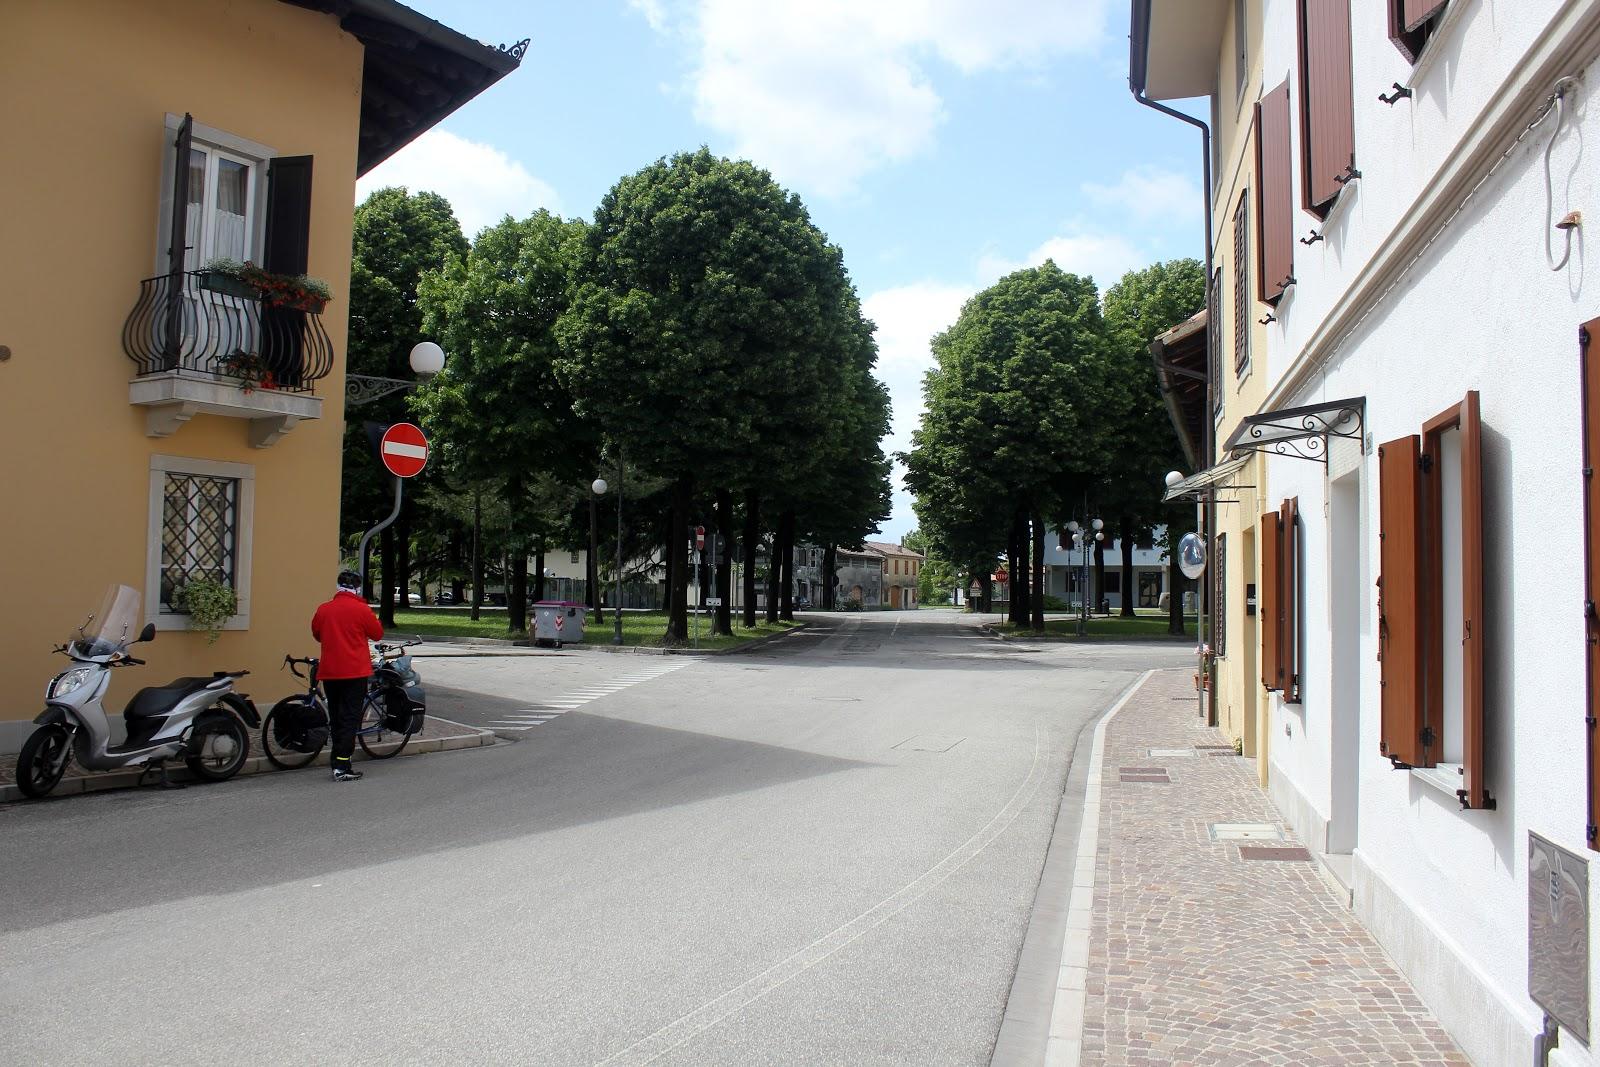 Day 5 - 2013-05-29 - Udine to Trieste - IMG_9511.JPG